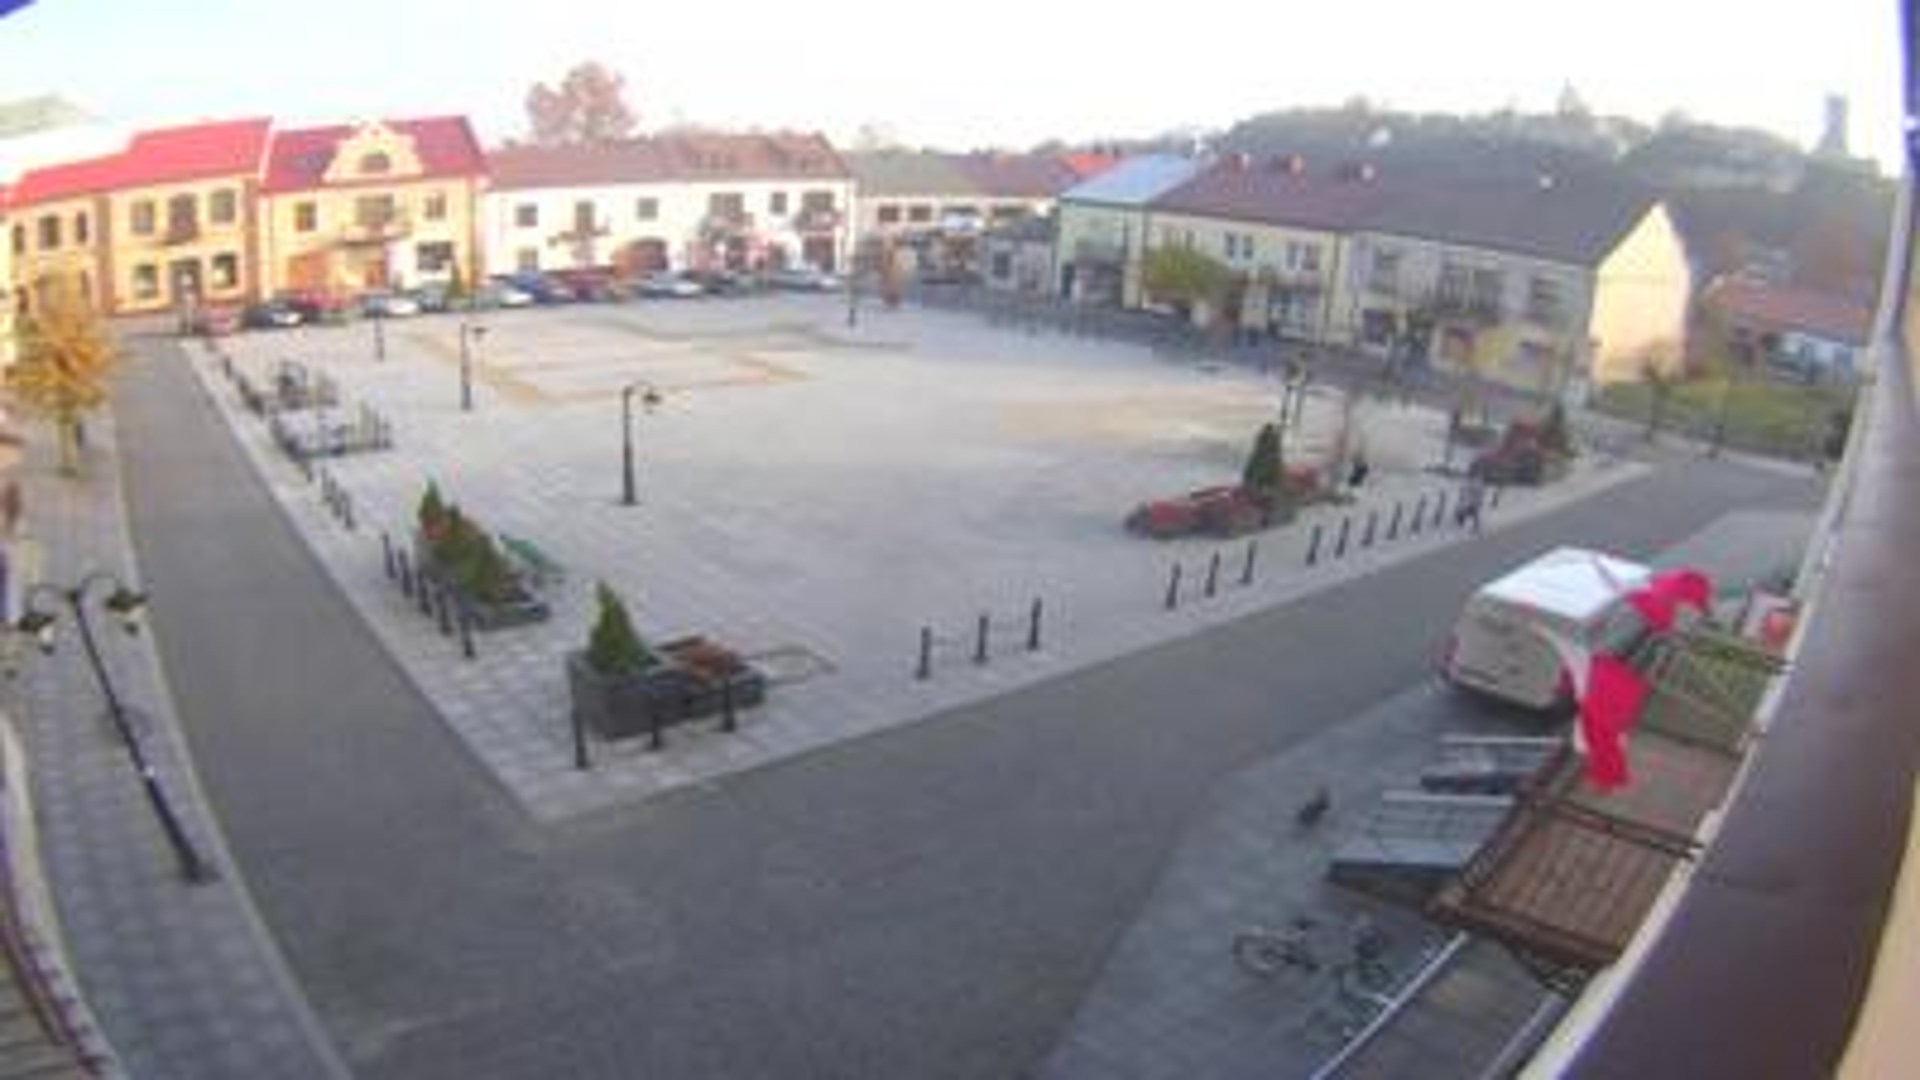 Webcam Iłża › North-East: Rynek